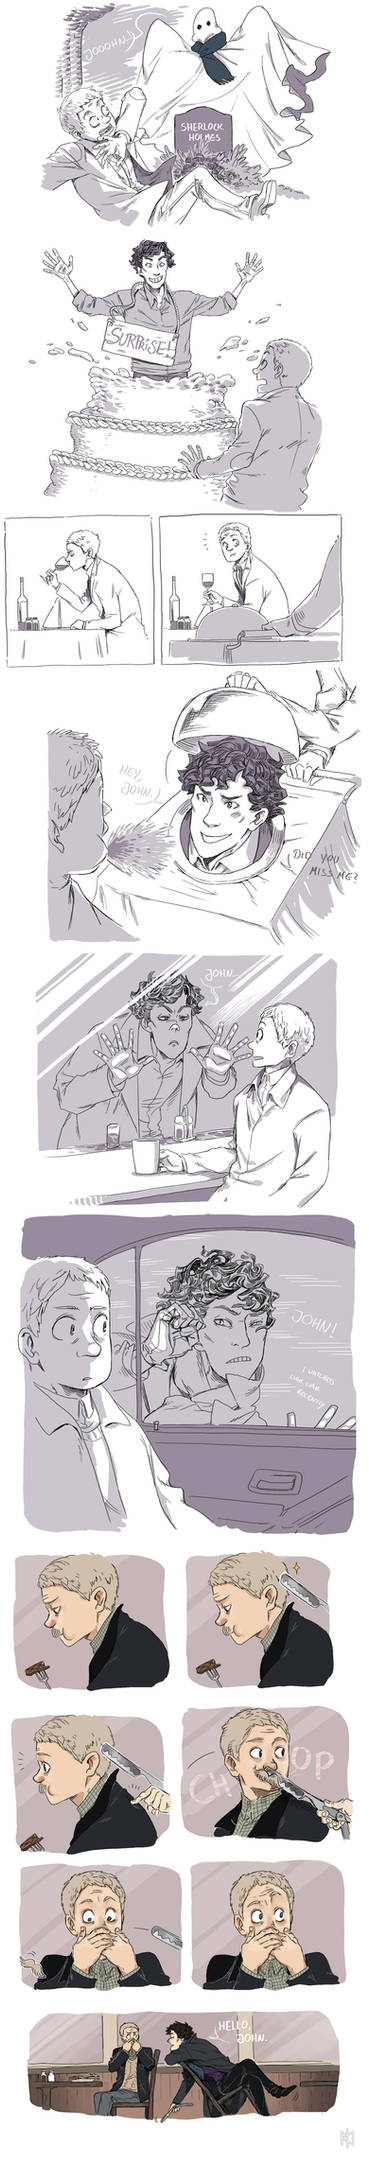 Sherlock's Return